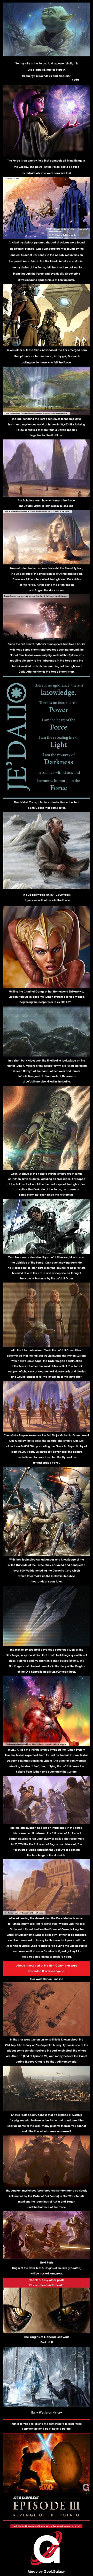 Origins of the Jedi (Star Wars History).